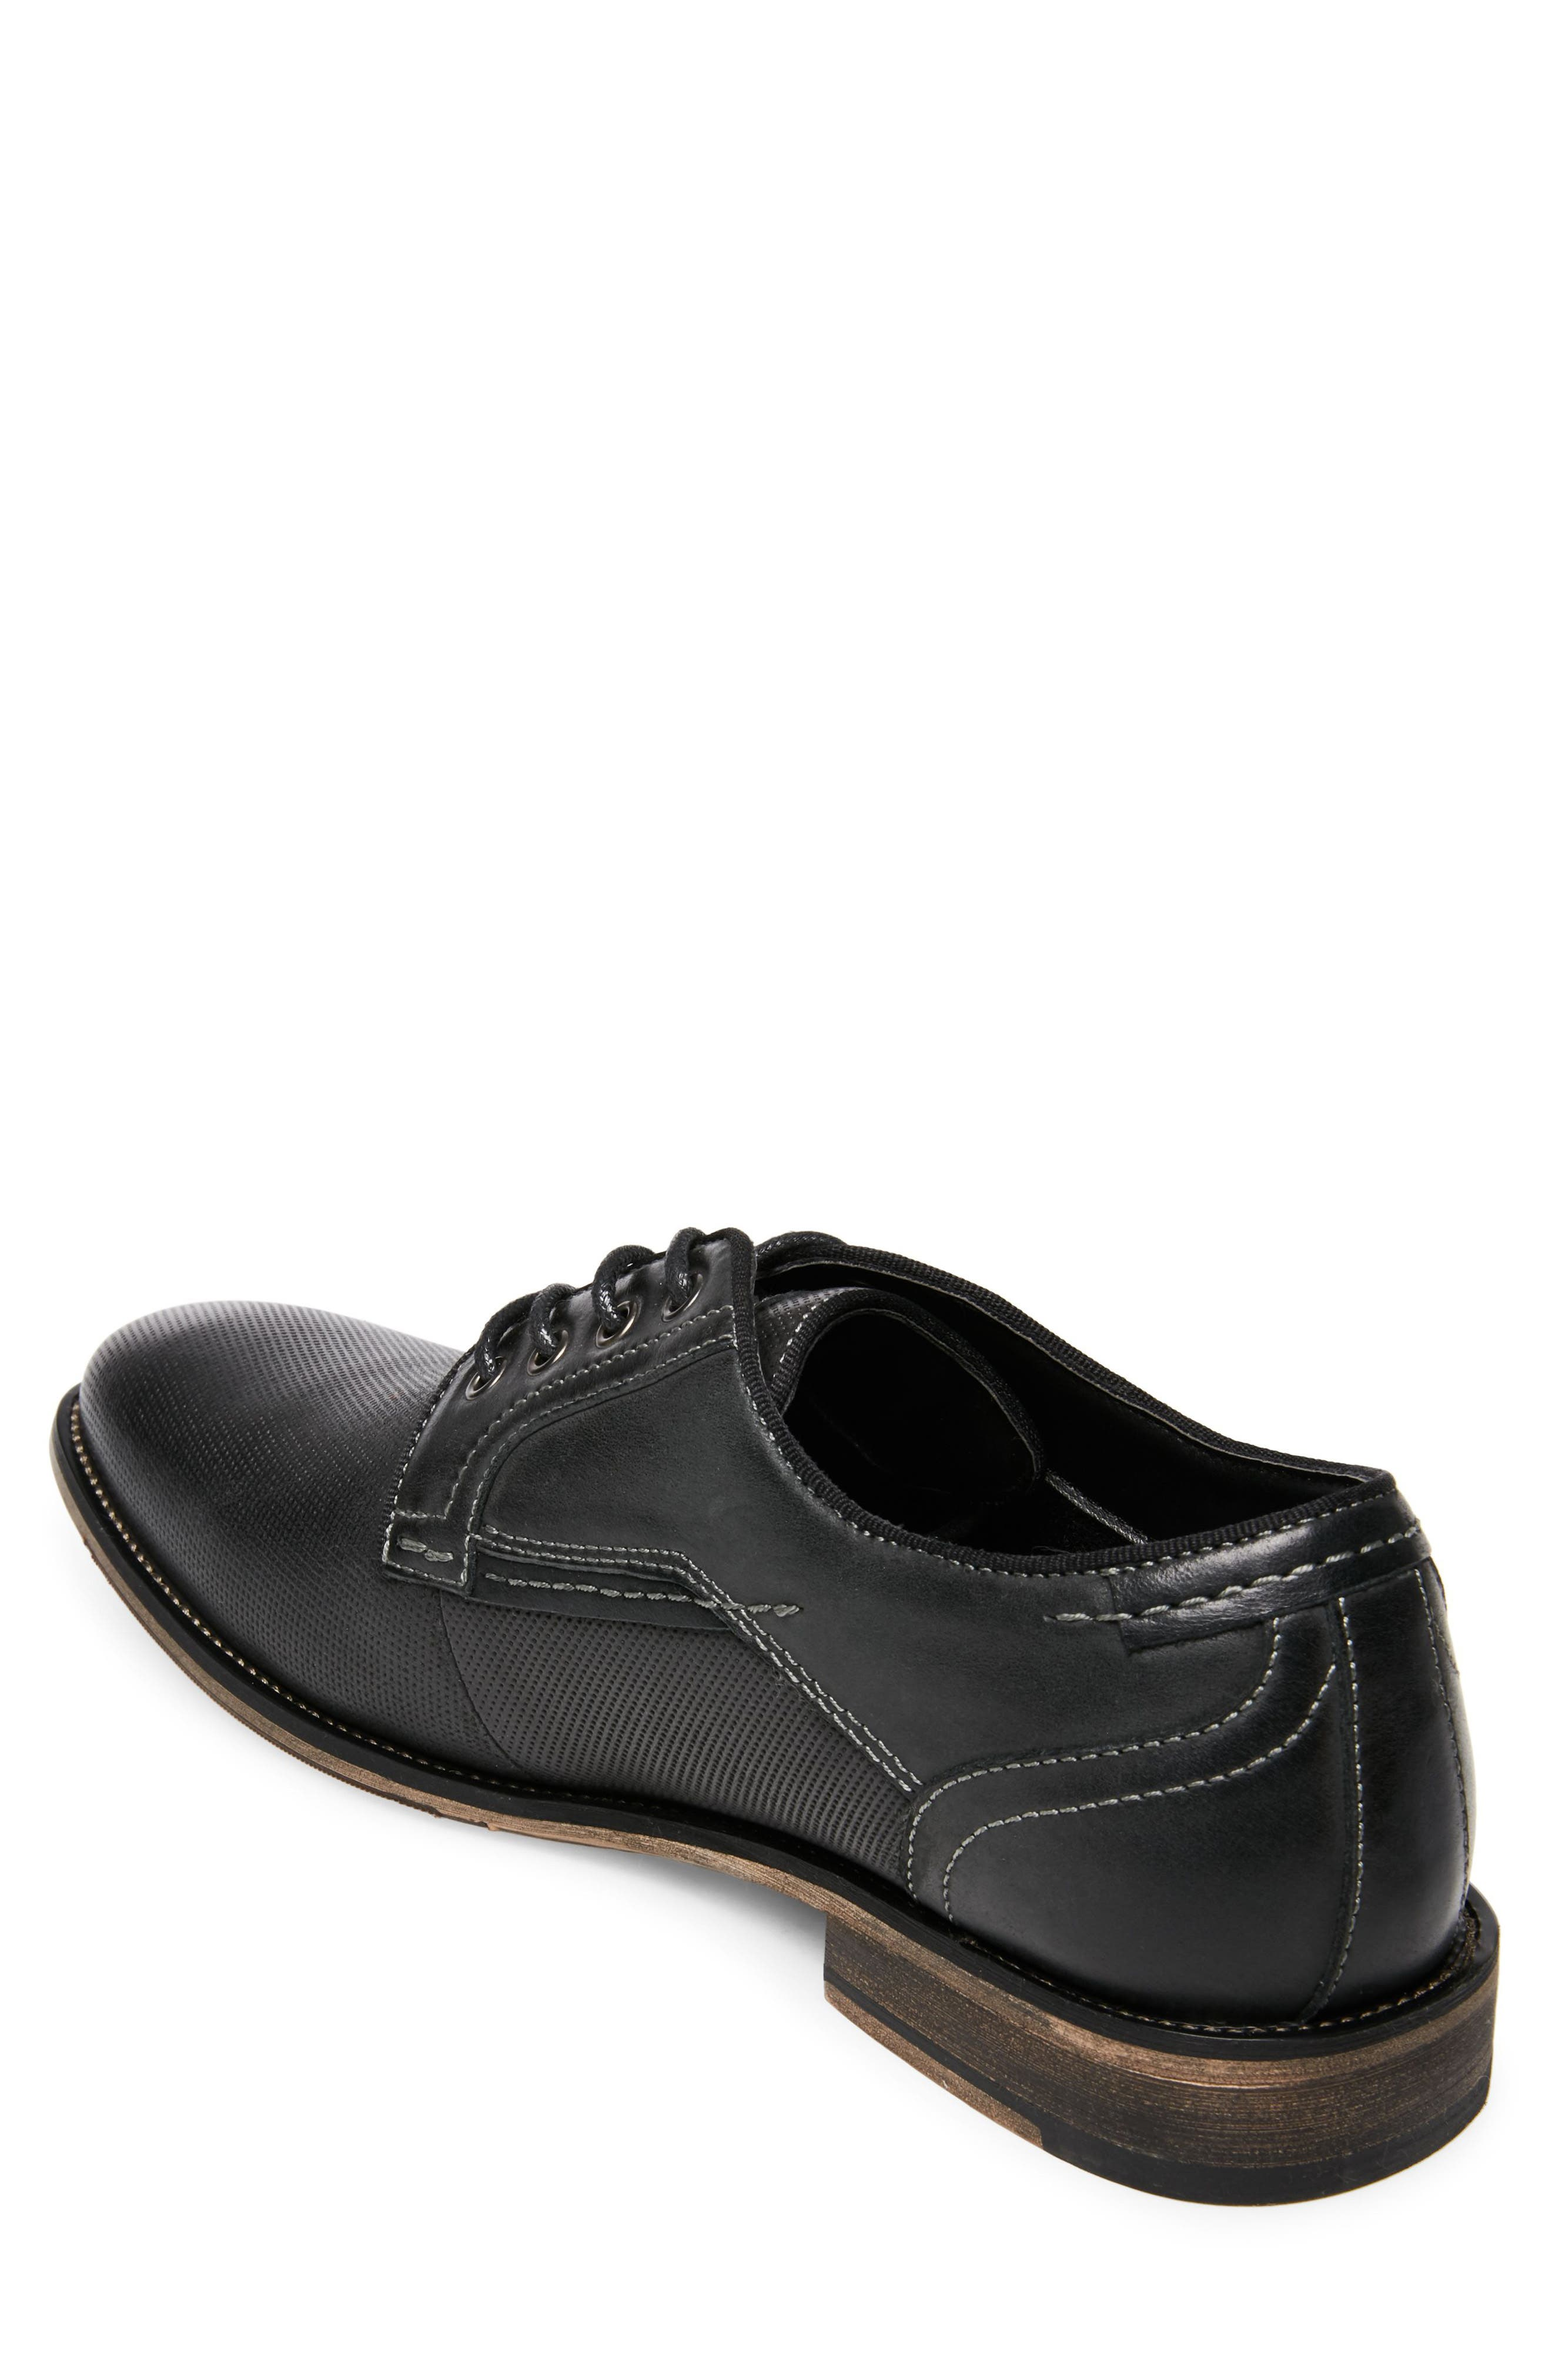 Jaysun Embossed Plain Toe Derby,                             Alternate thumbnail 2, color,                             Dark Grey Leather